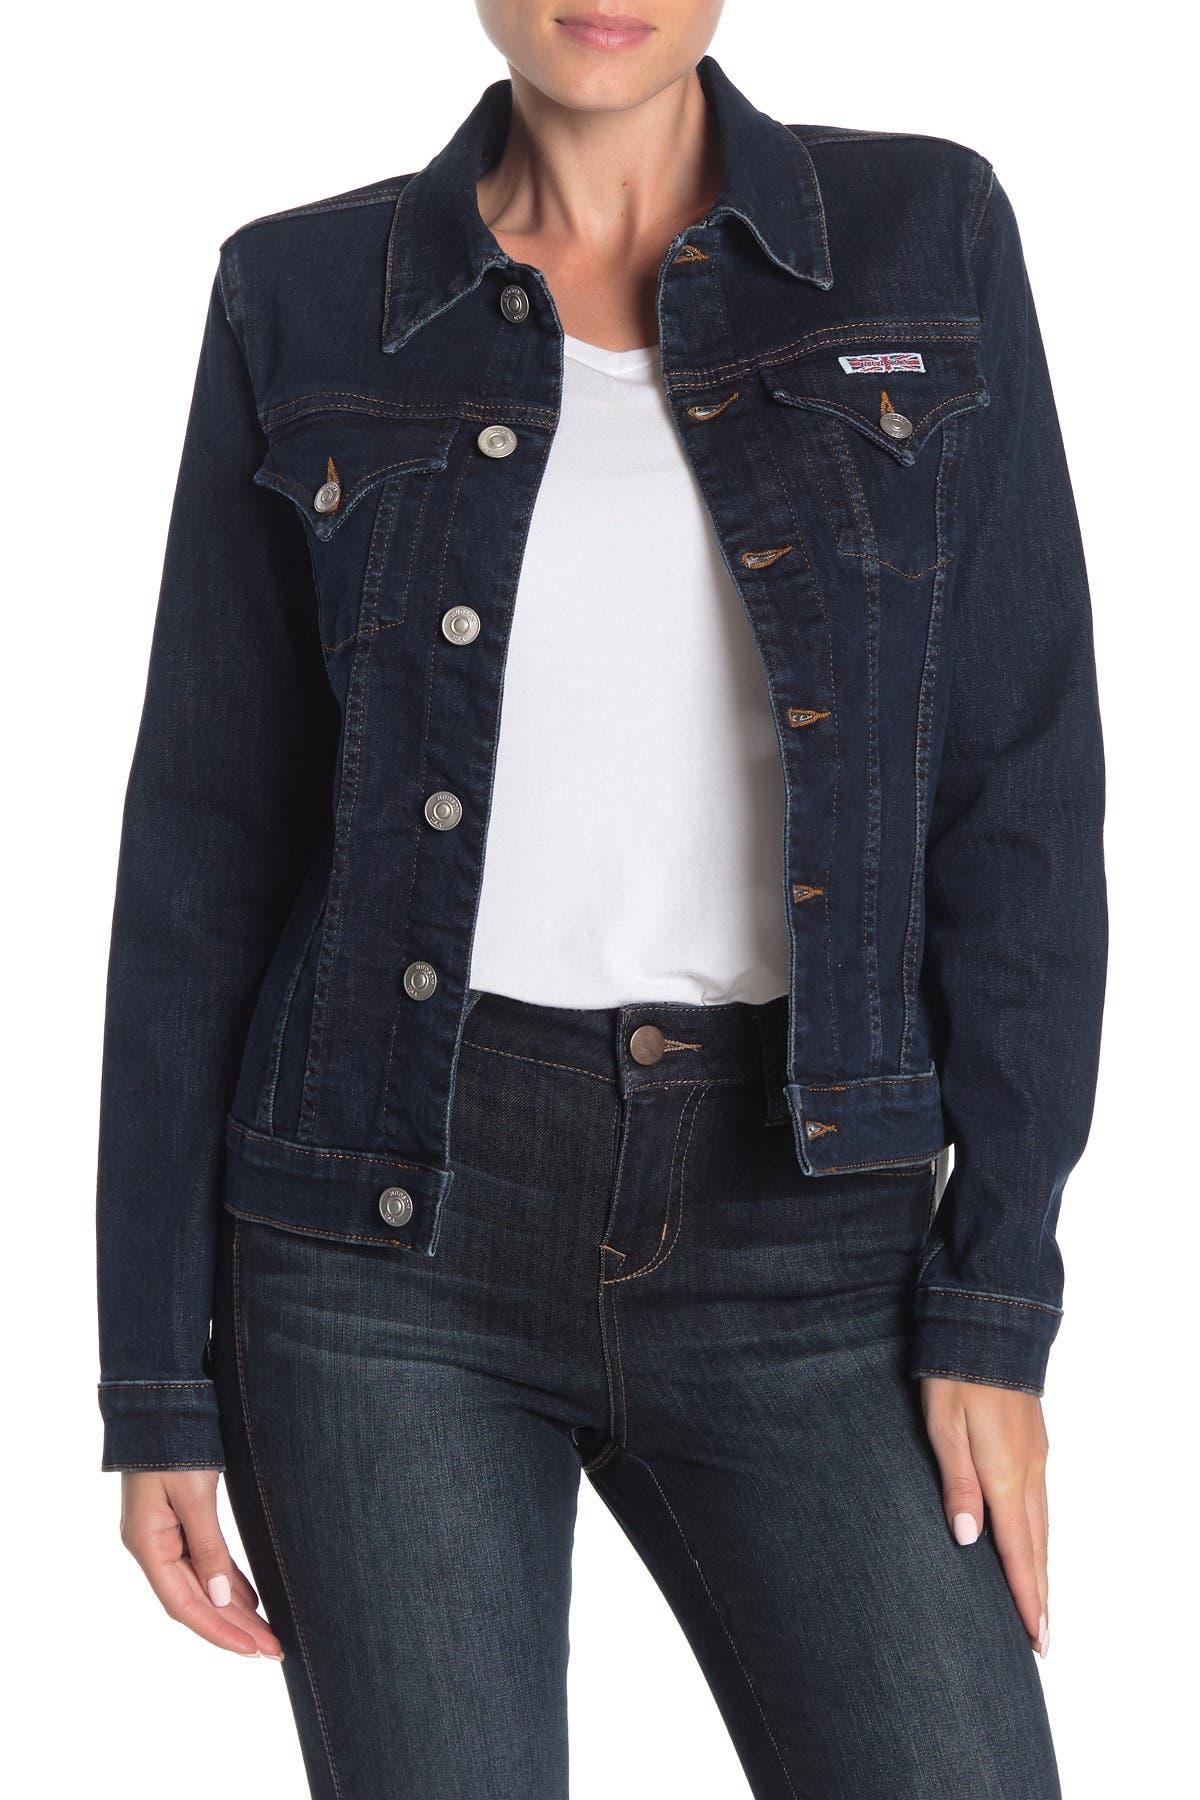 Image of HUDSON Jeans Signature Denim Jacket